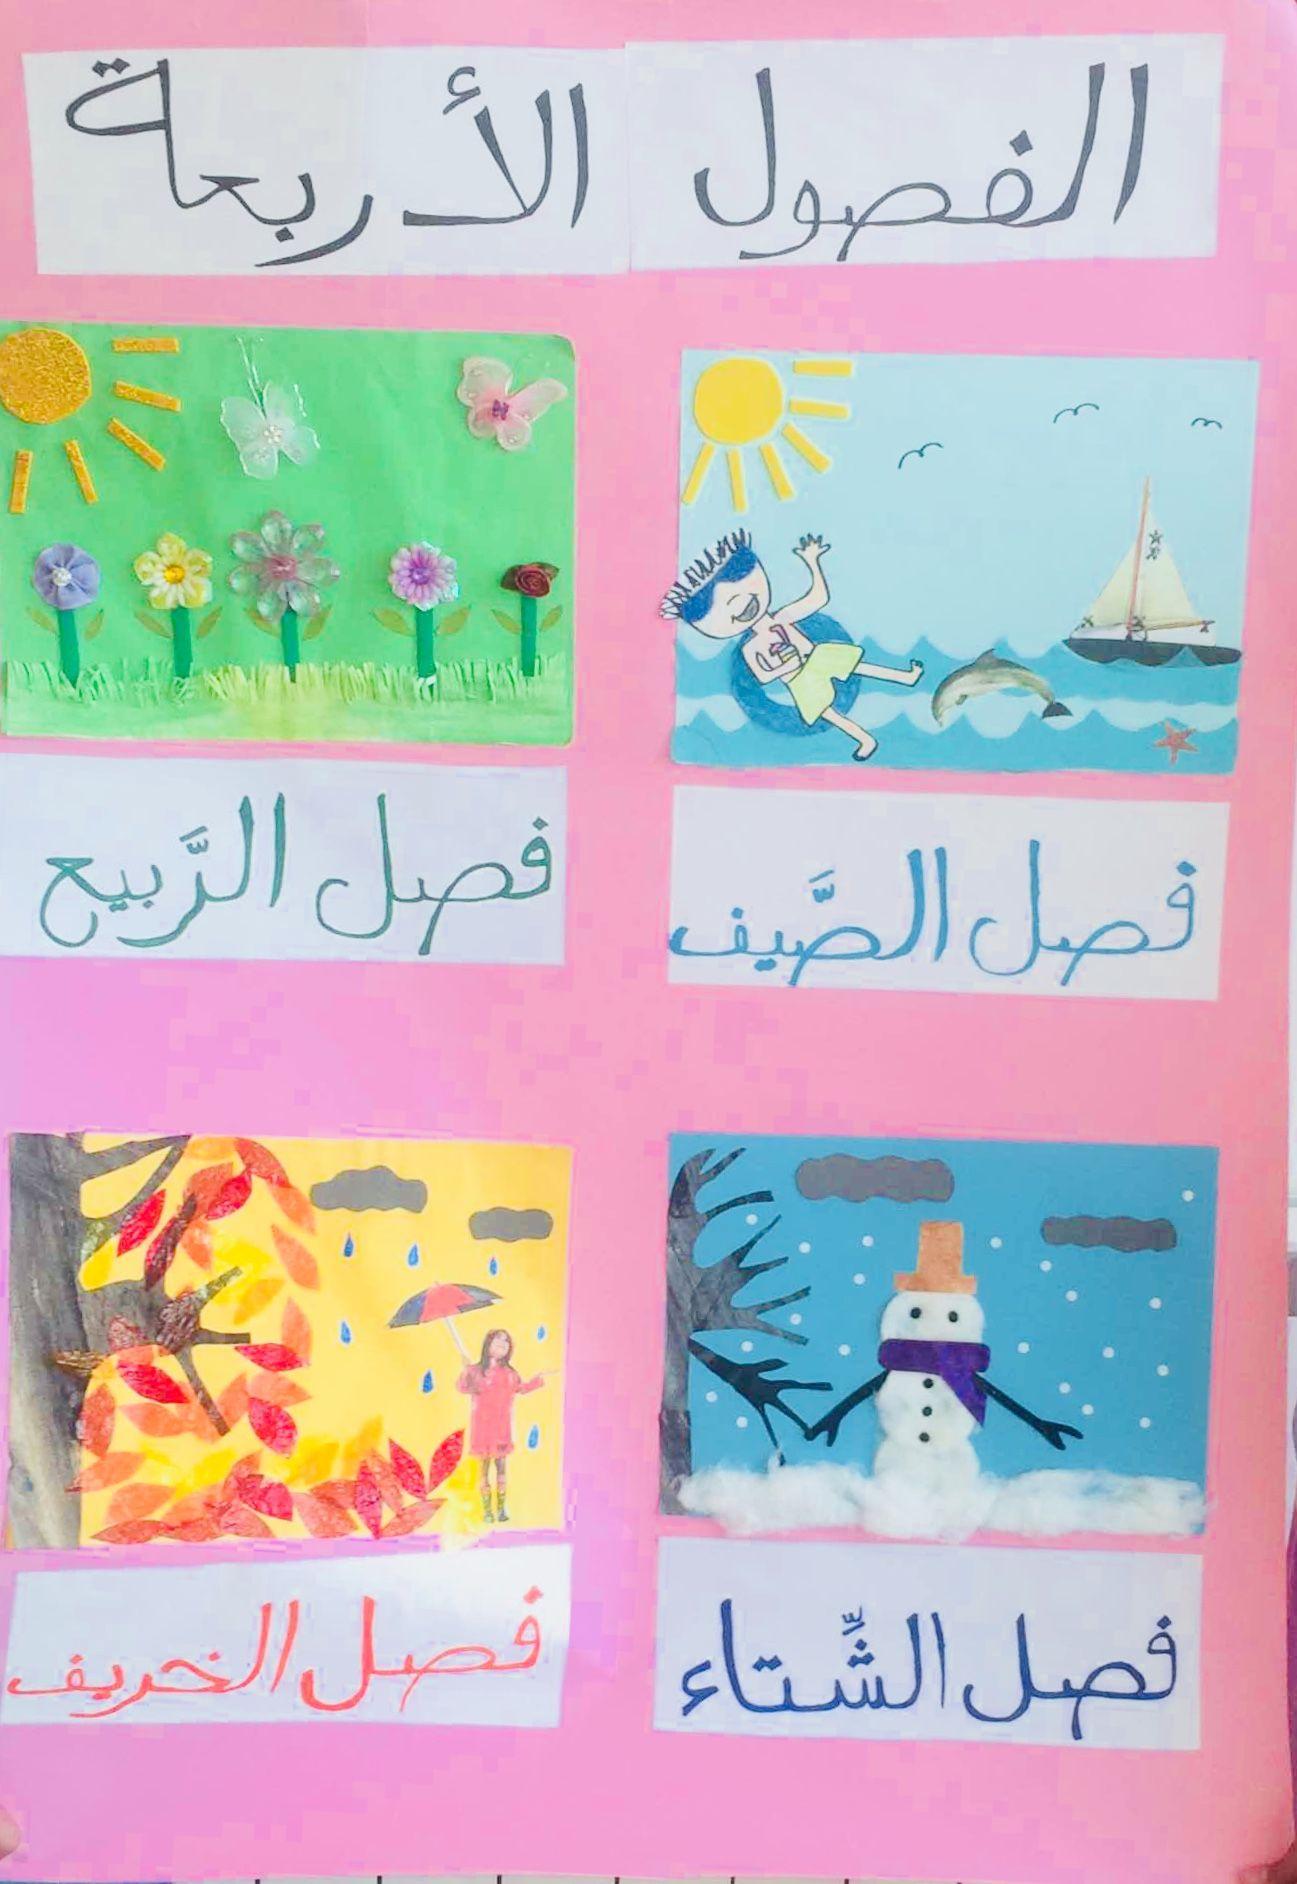 Seasons Poster Art For Kids Pic Only لوحة عمل يدوي للأطفال عن الفصول الأربعة صورة فقط Save